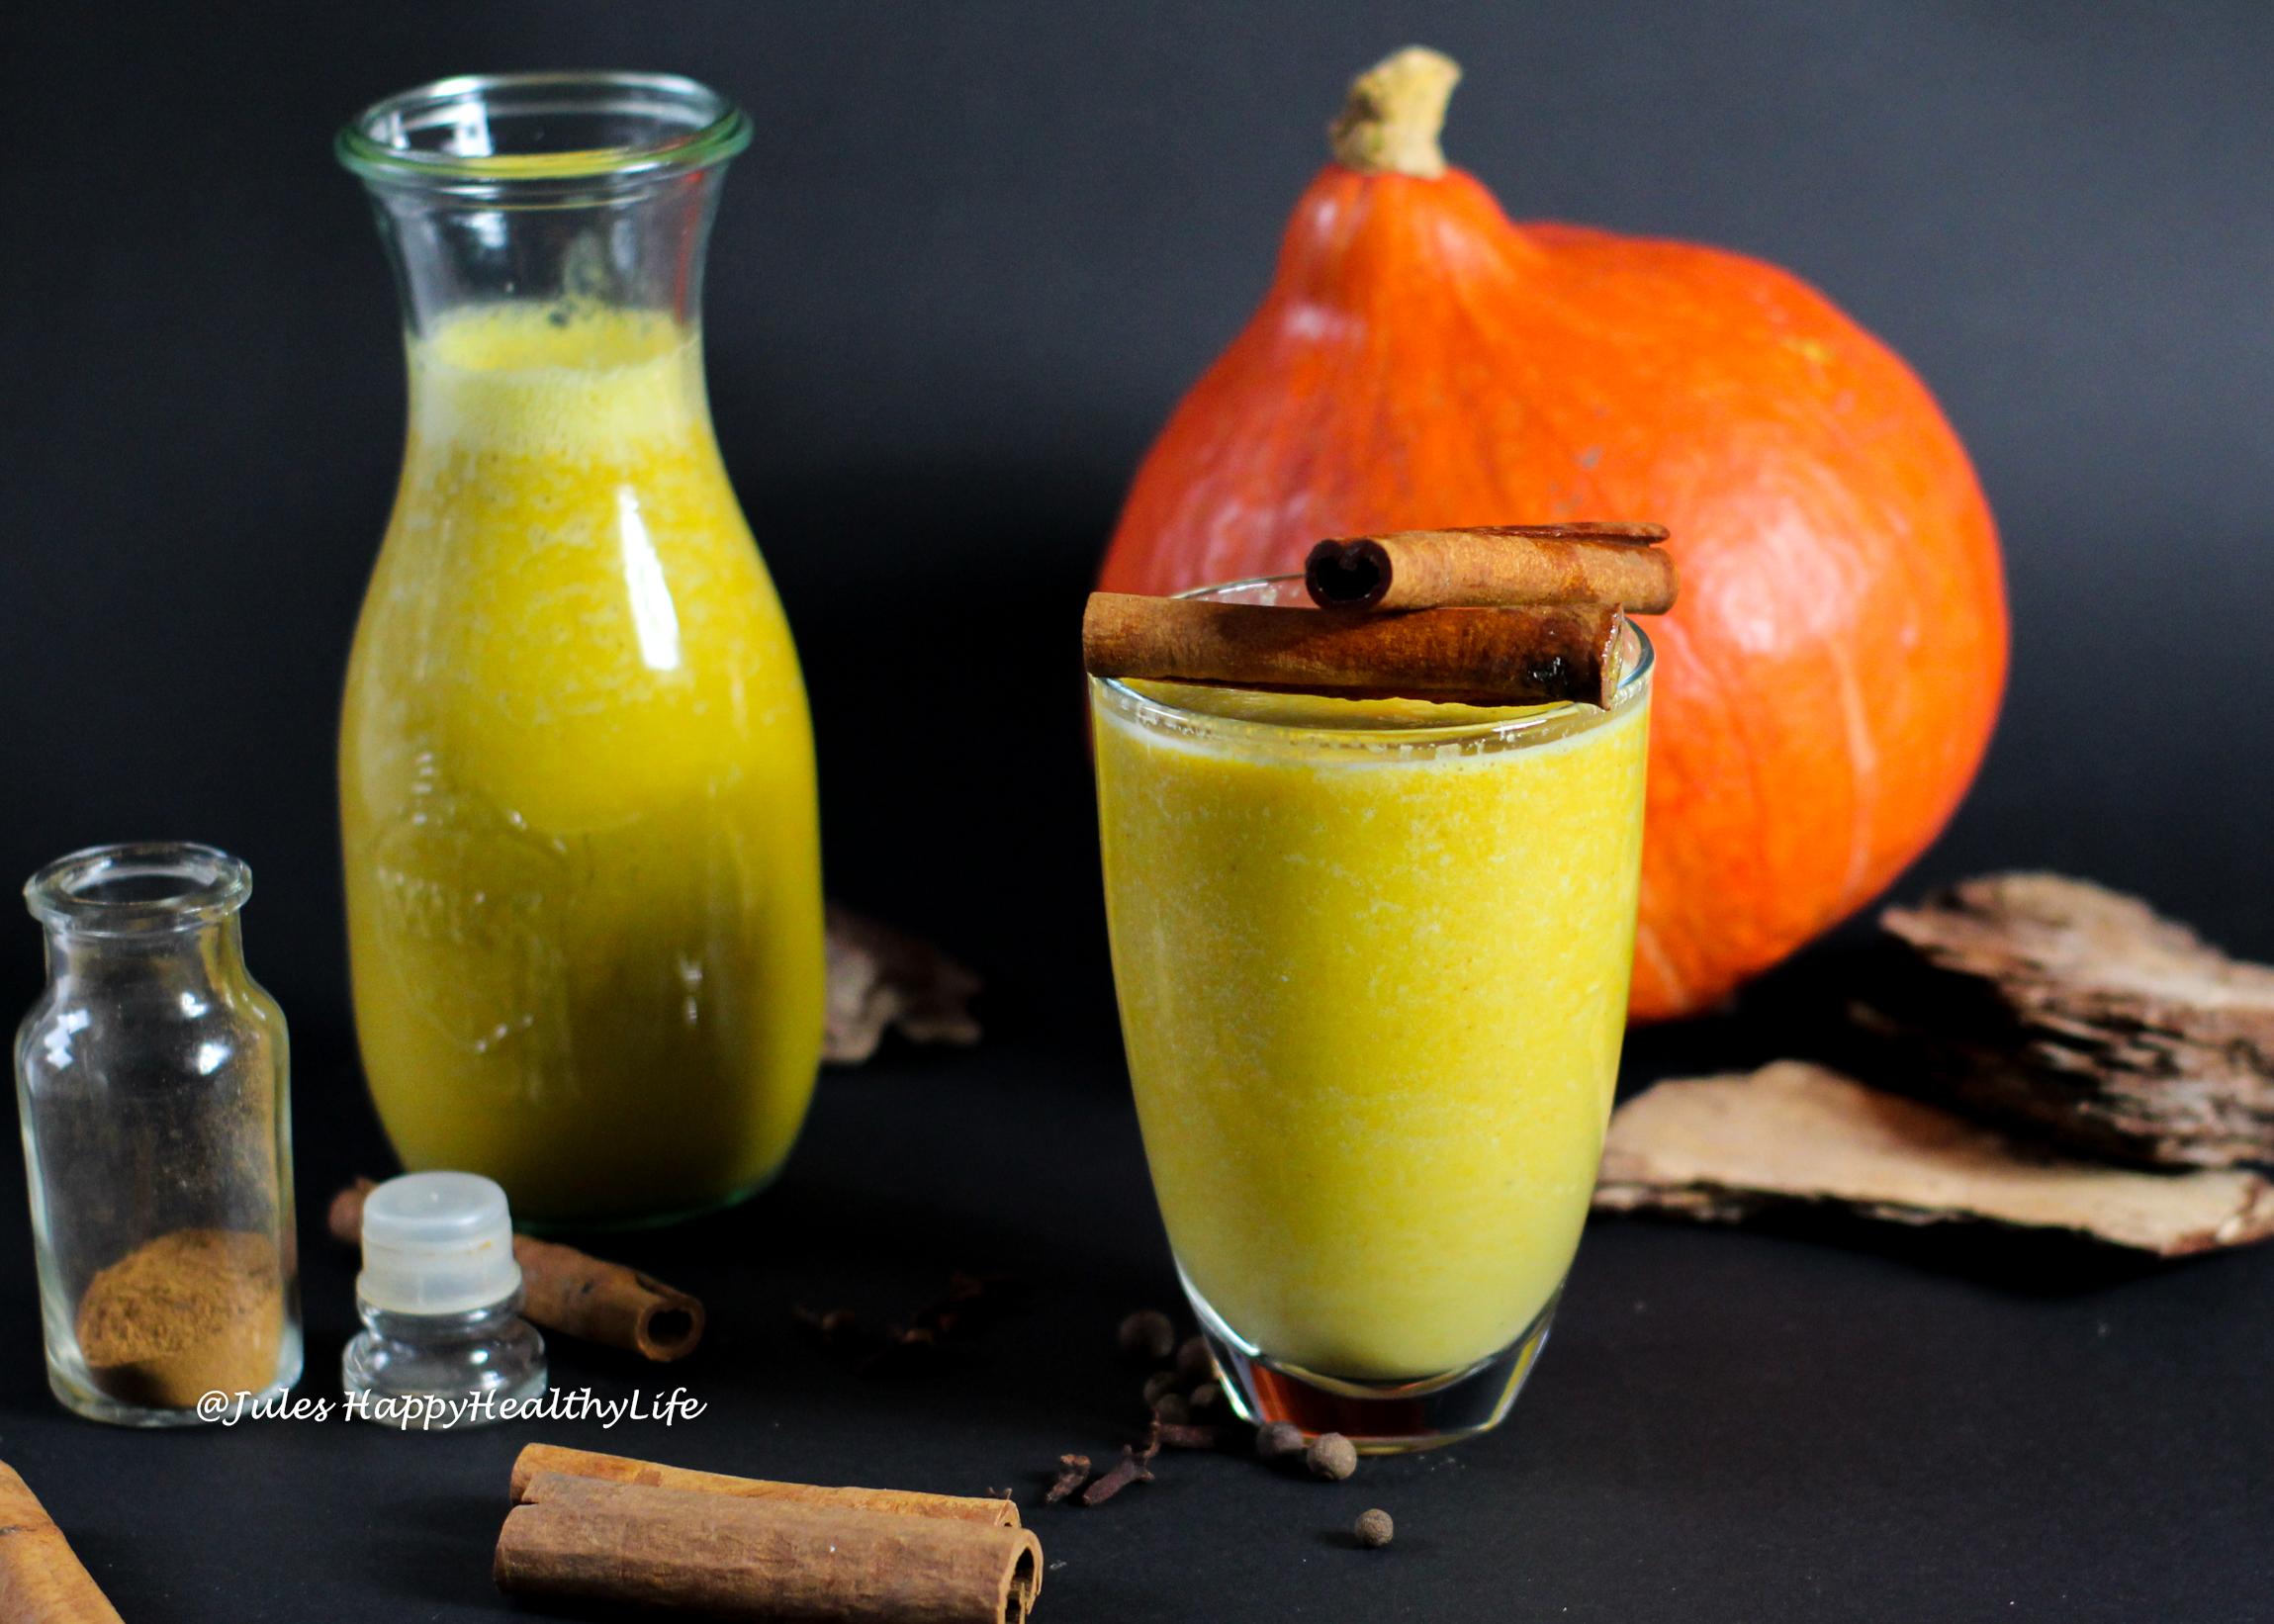 Fall Recipe - Pumpkin Almond Milk with Pumpkin Spice